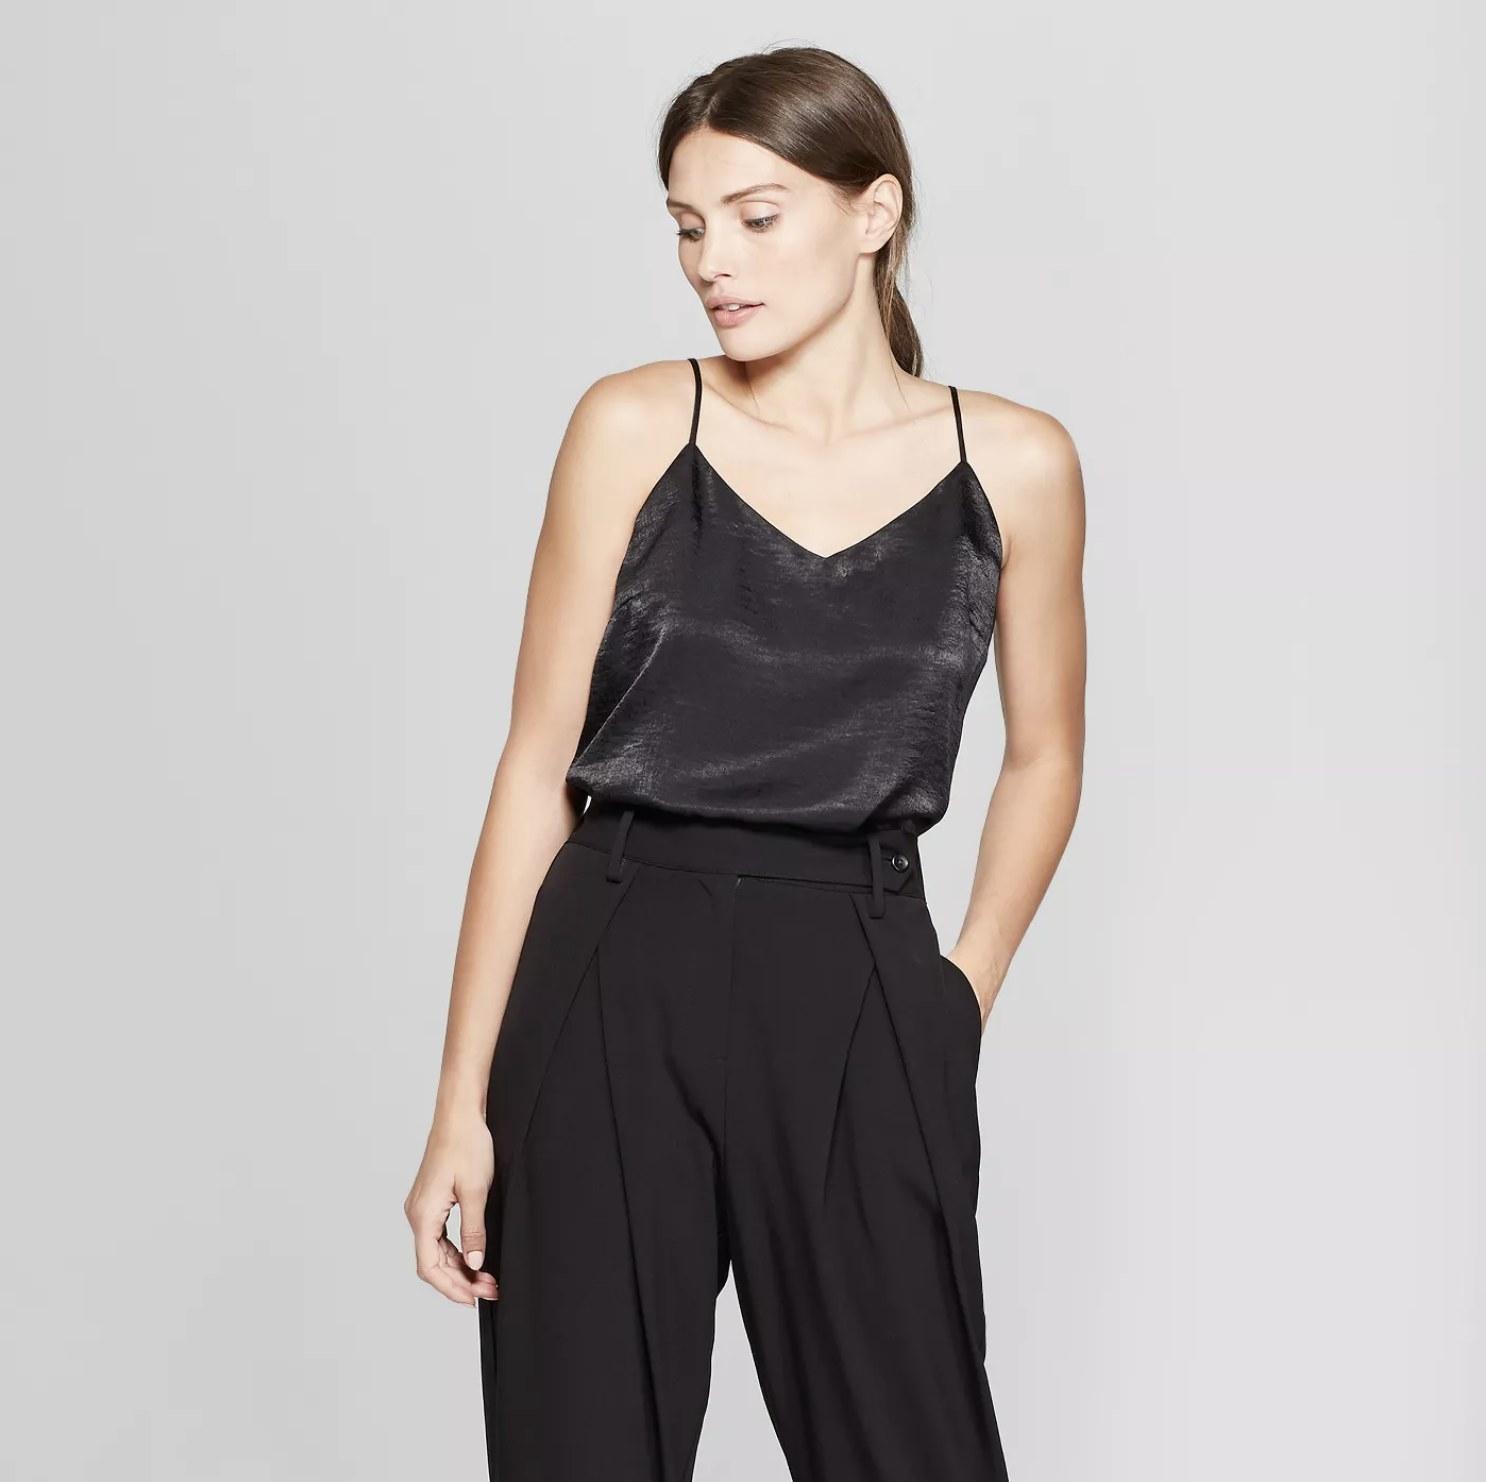 Model is wearing a black woven blouse tank with black slacks